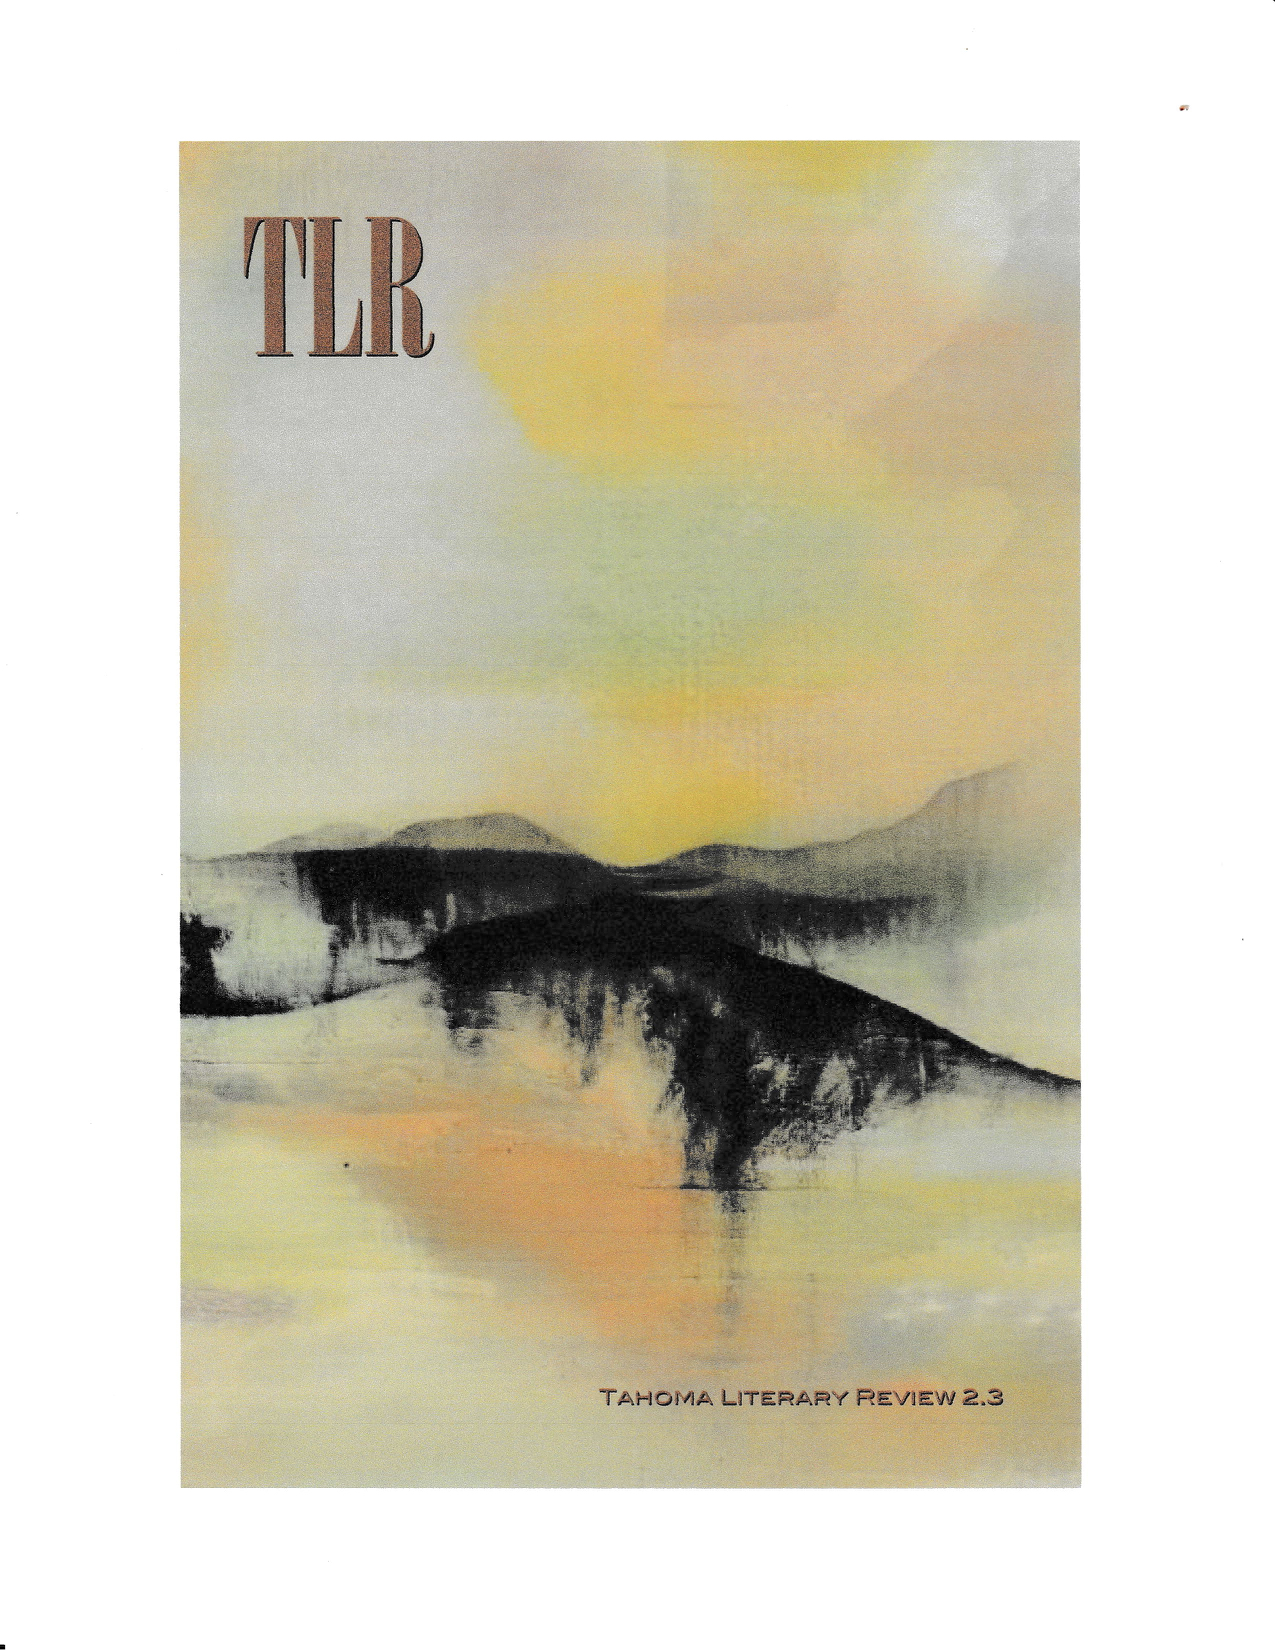 Tahoma_Literary_Review_The_Emperor 01.jpg